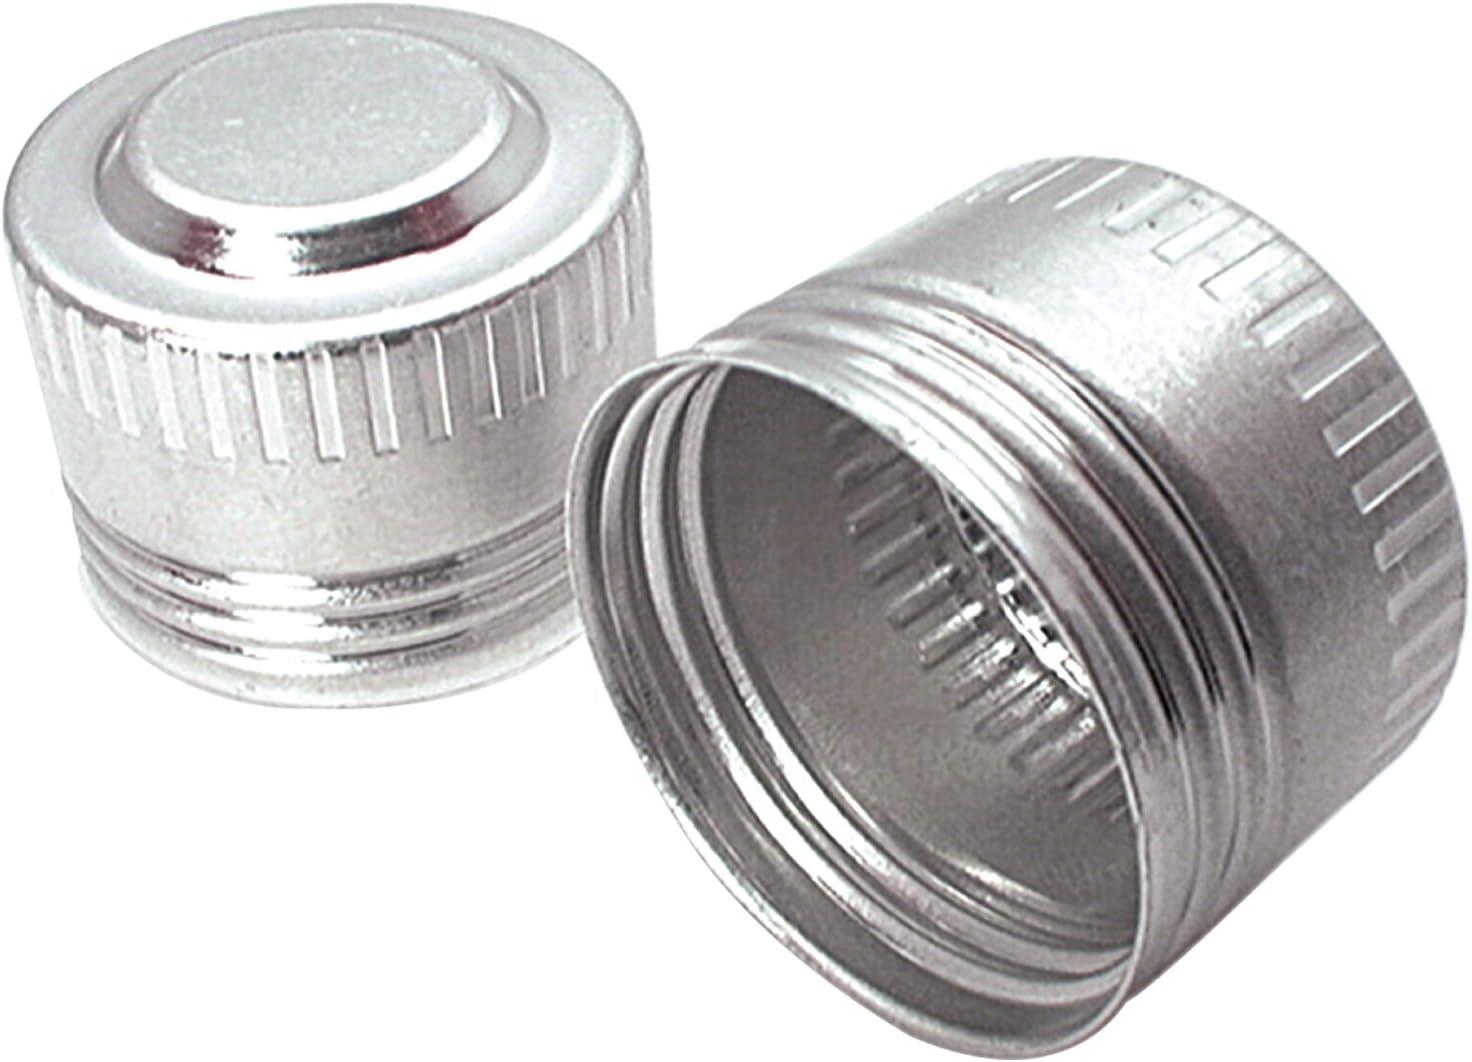 12AN 1-1//16-12 Thread, Allstar Performance ALL50826 Aluminum Cap for Pack of 10